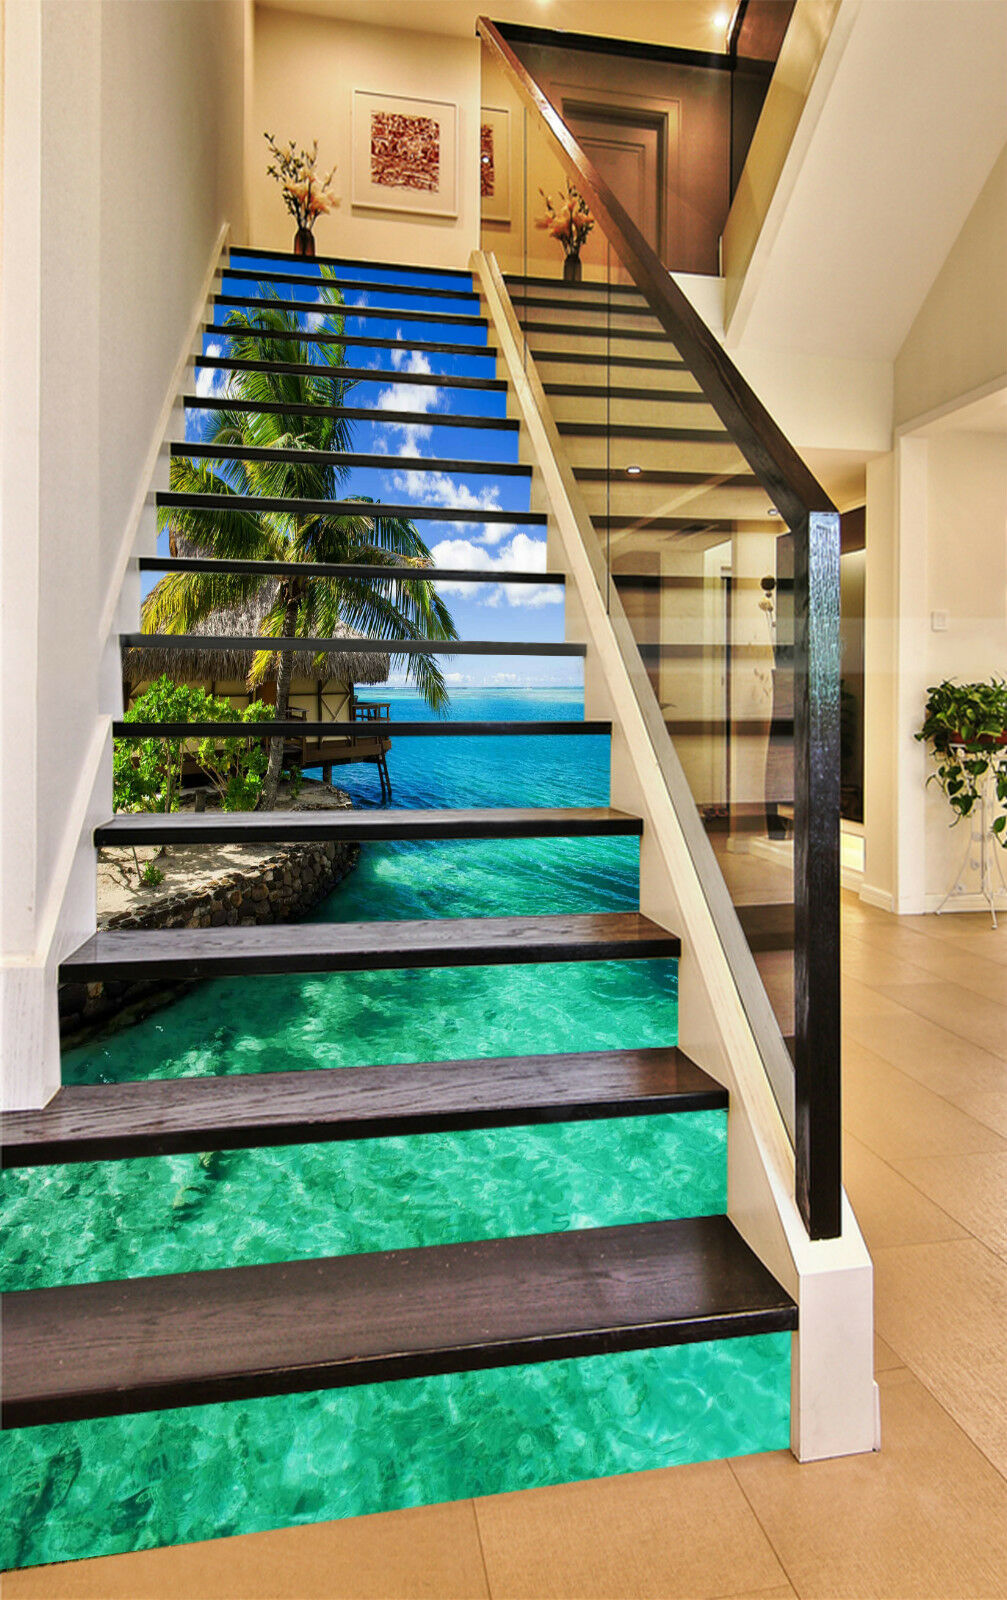 3D Klares Meer 8311 Stair Risers Dekoration Fototapete Vinyl Aufkleber Tapete DE